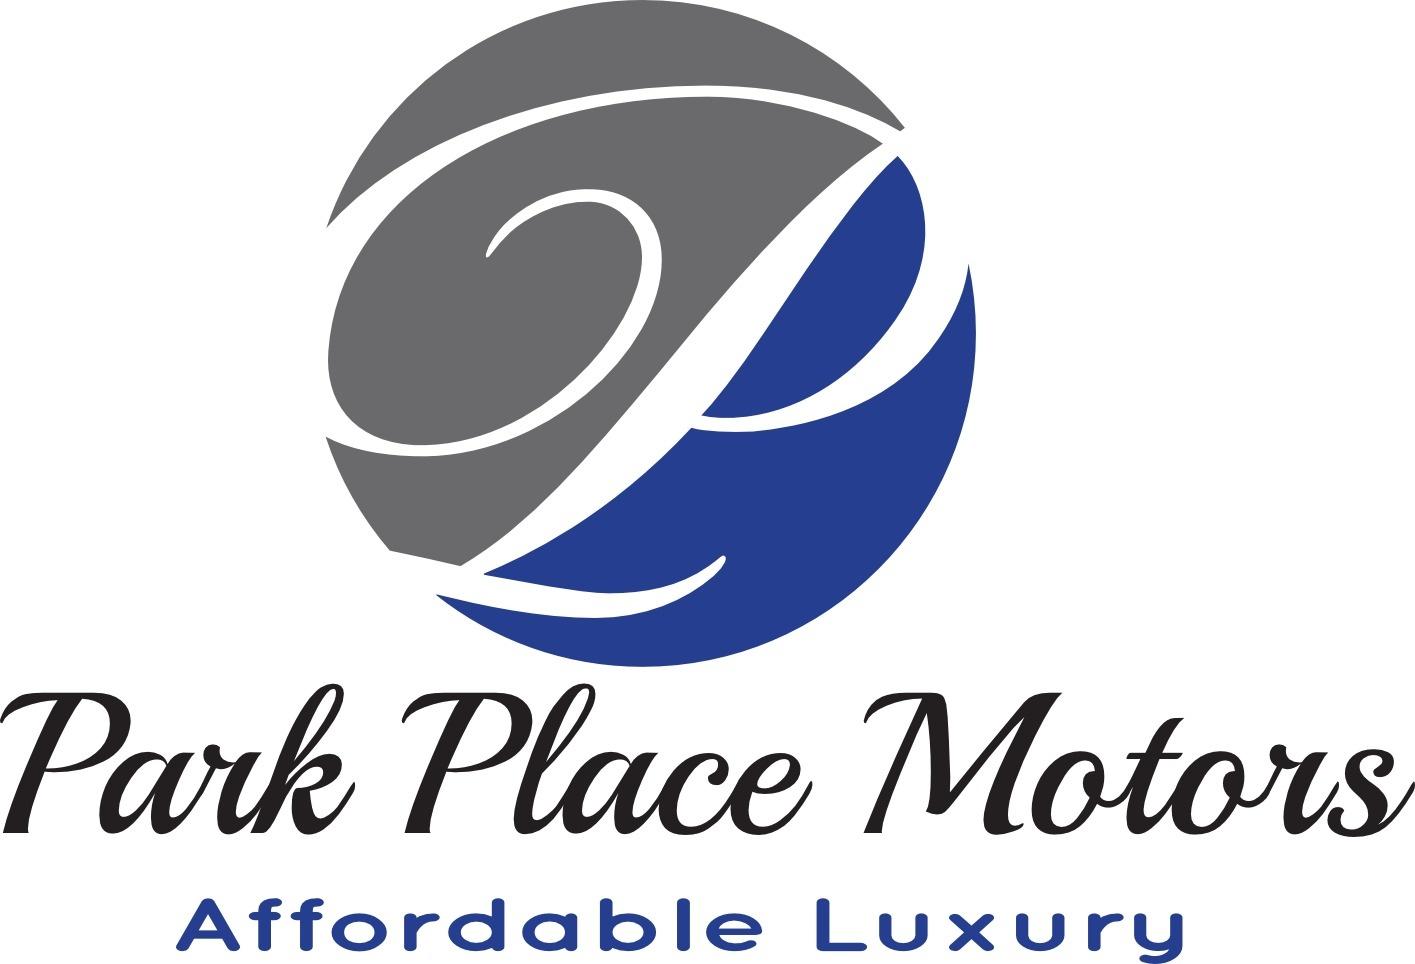 Park place motors crossville tn read consumer reviews for Park place motors crossville tn